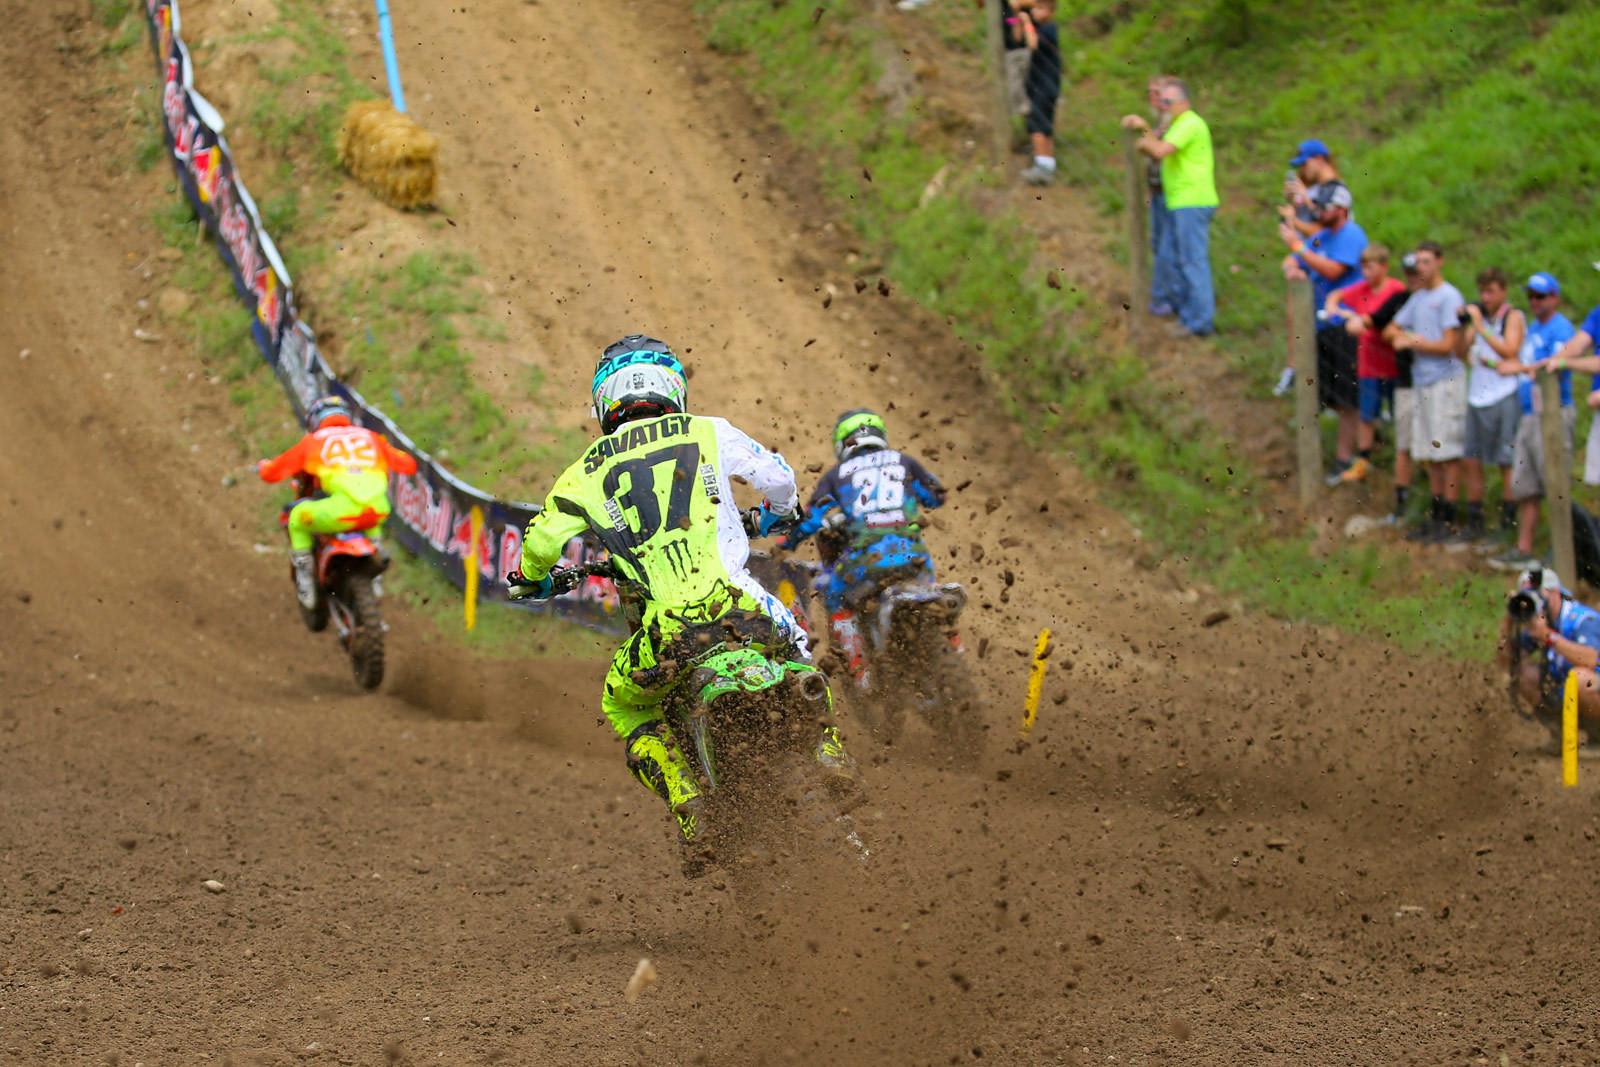 Mitchell Oldenburg, Alex Martin, and Joey Savatgy - Photo Blast: Ironman - Motocross Pictures - Vital MX